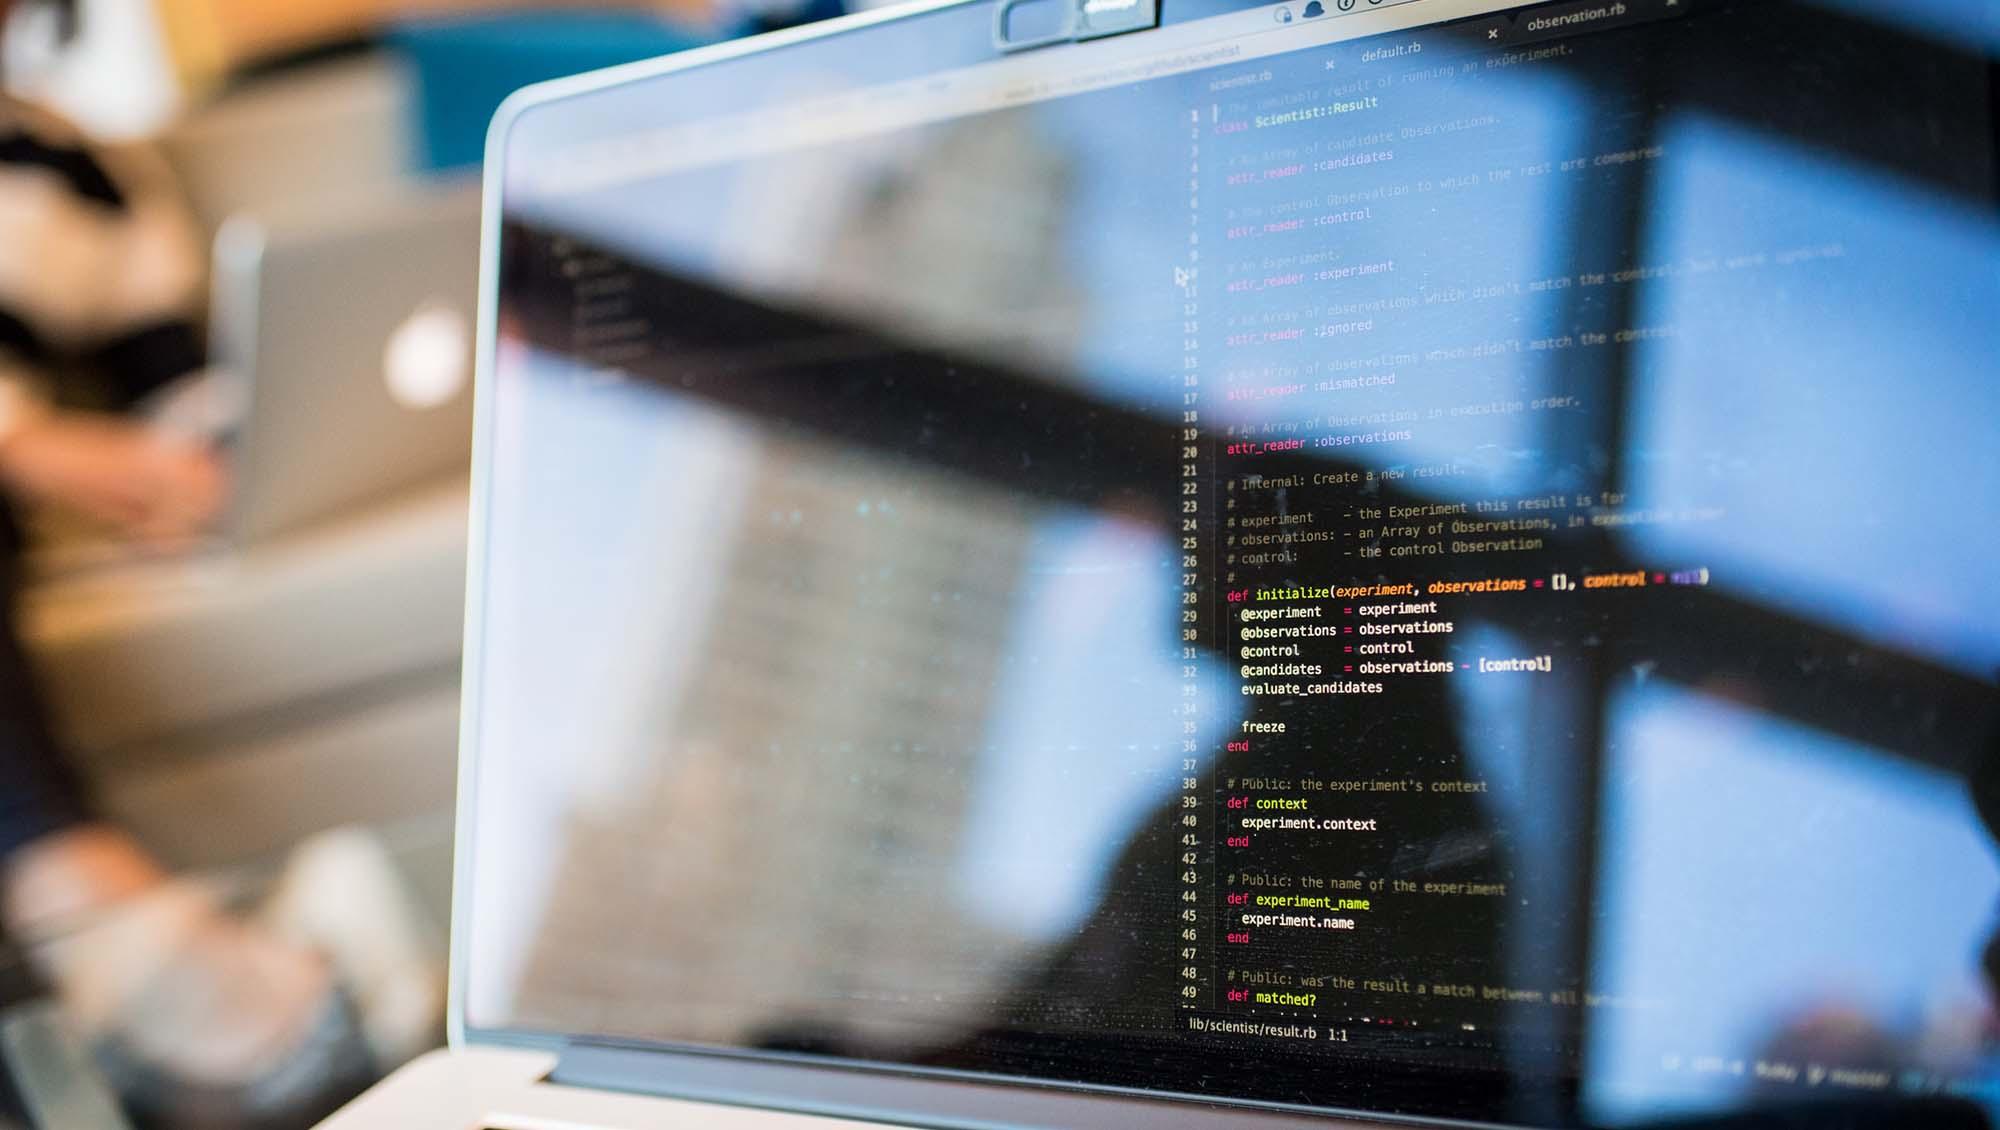 Quels sont les logiciels libres que l'État conseille en 2019 ?